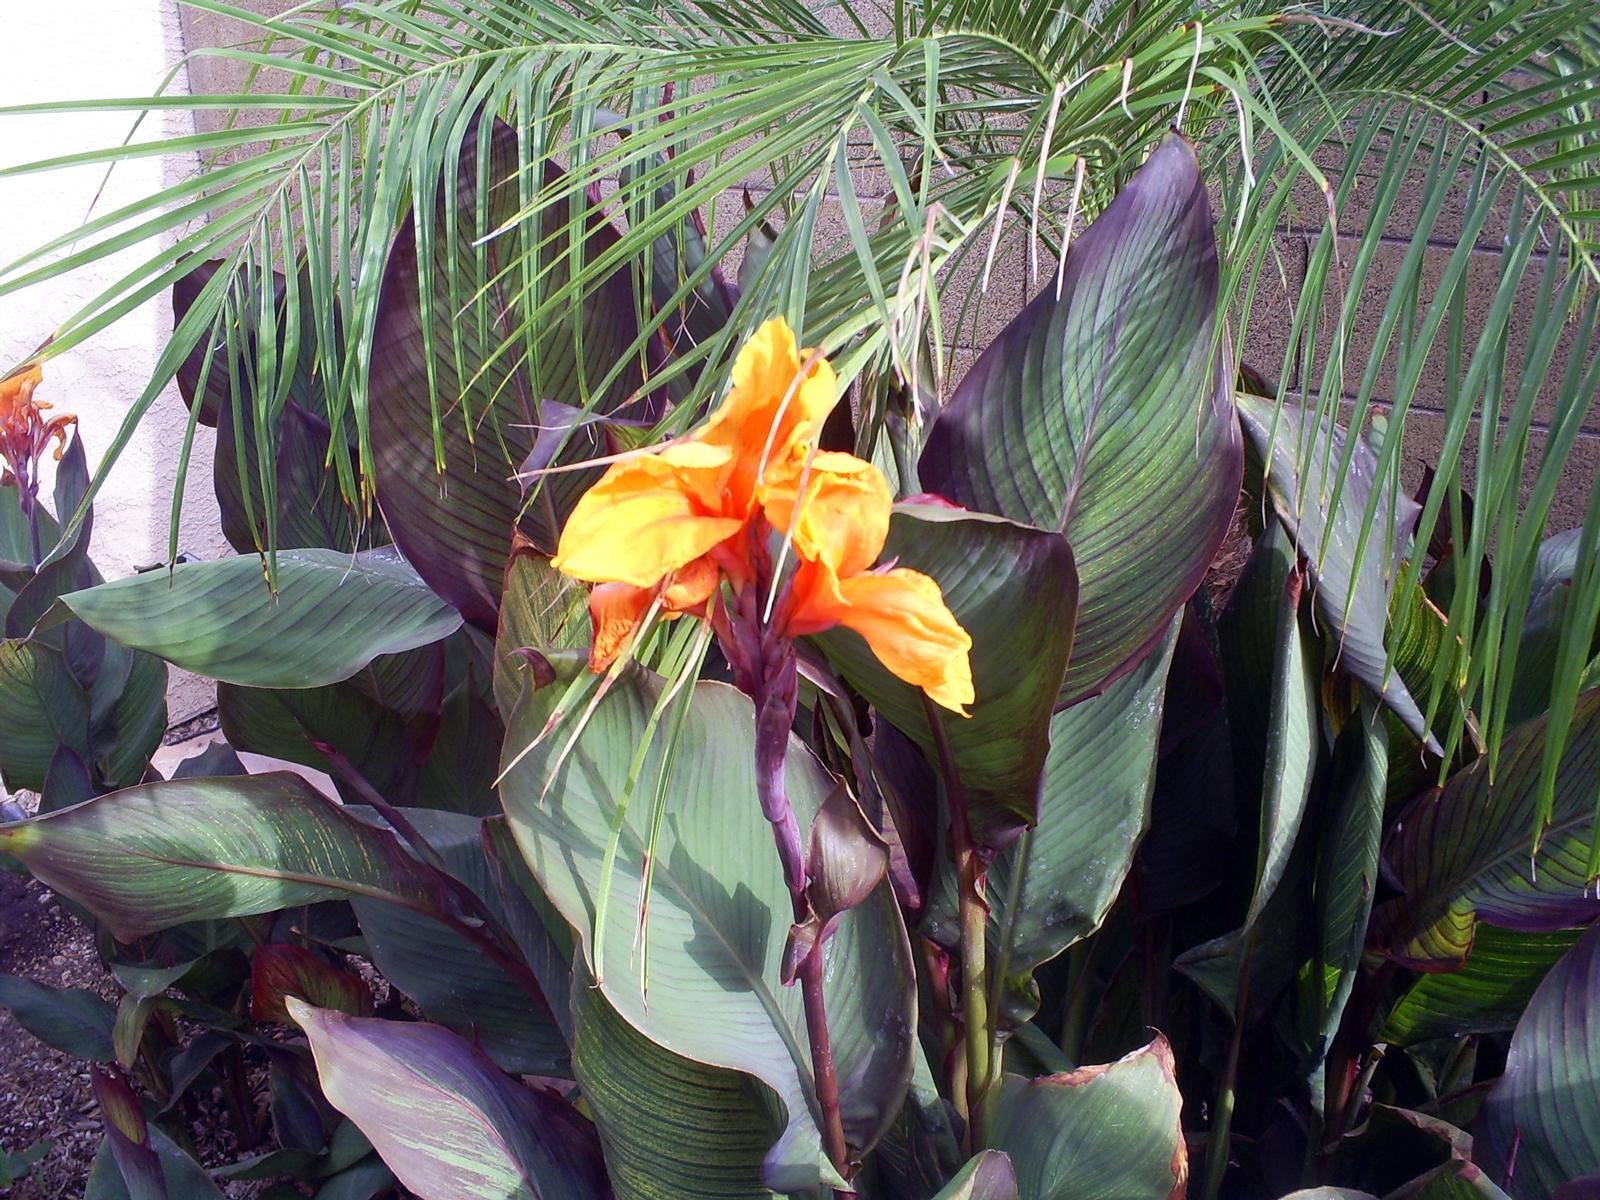 Brad s Tropical Paradise Flowering cannas in the desert